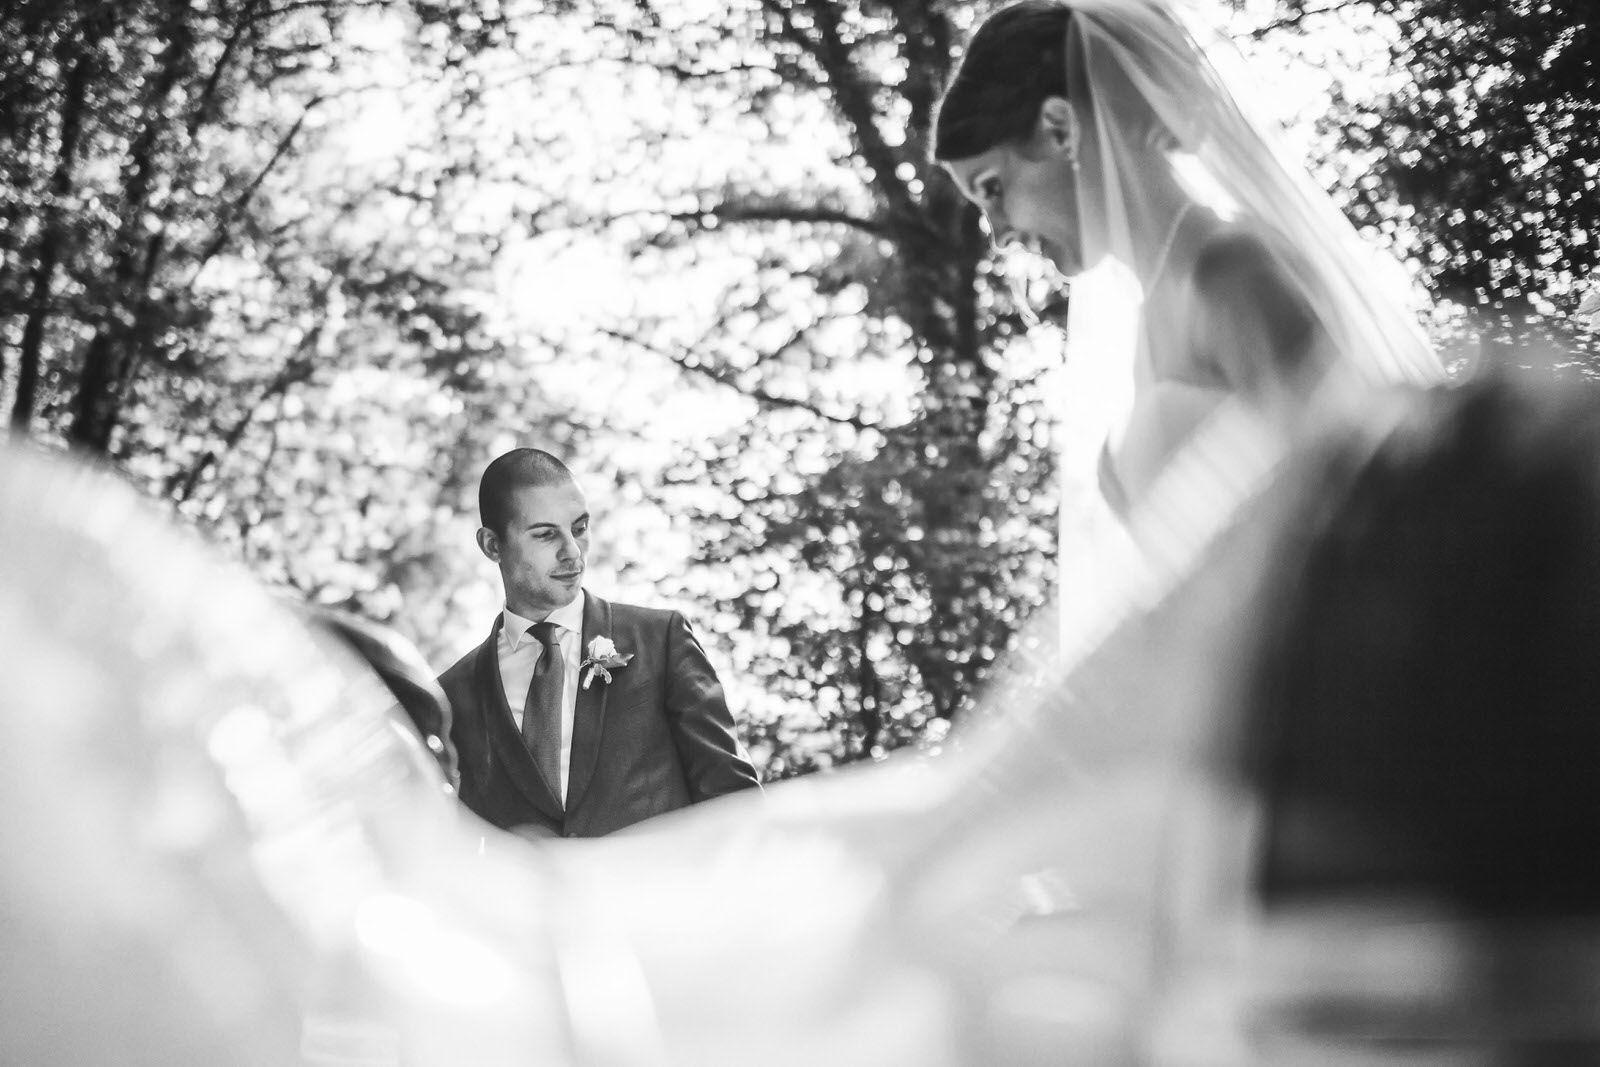 wedding photographer in italy-venice-tuscany-florence-amalfi coast-como lake-villa del balbianello-siena-amalfi-ravello-belmond-villa cimbrone15